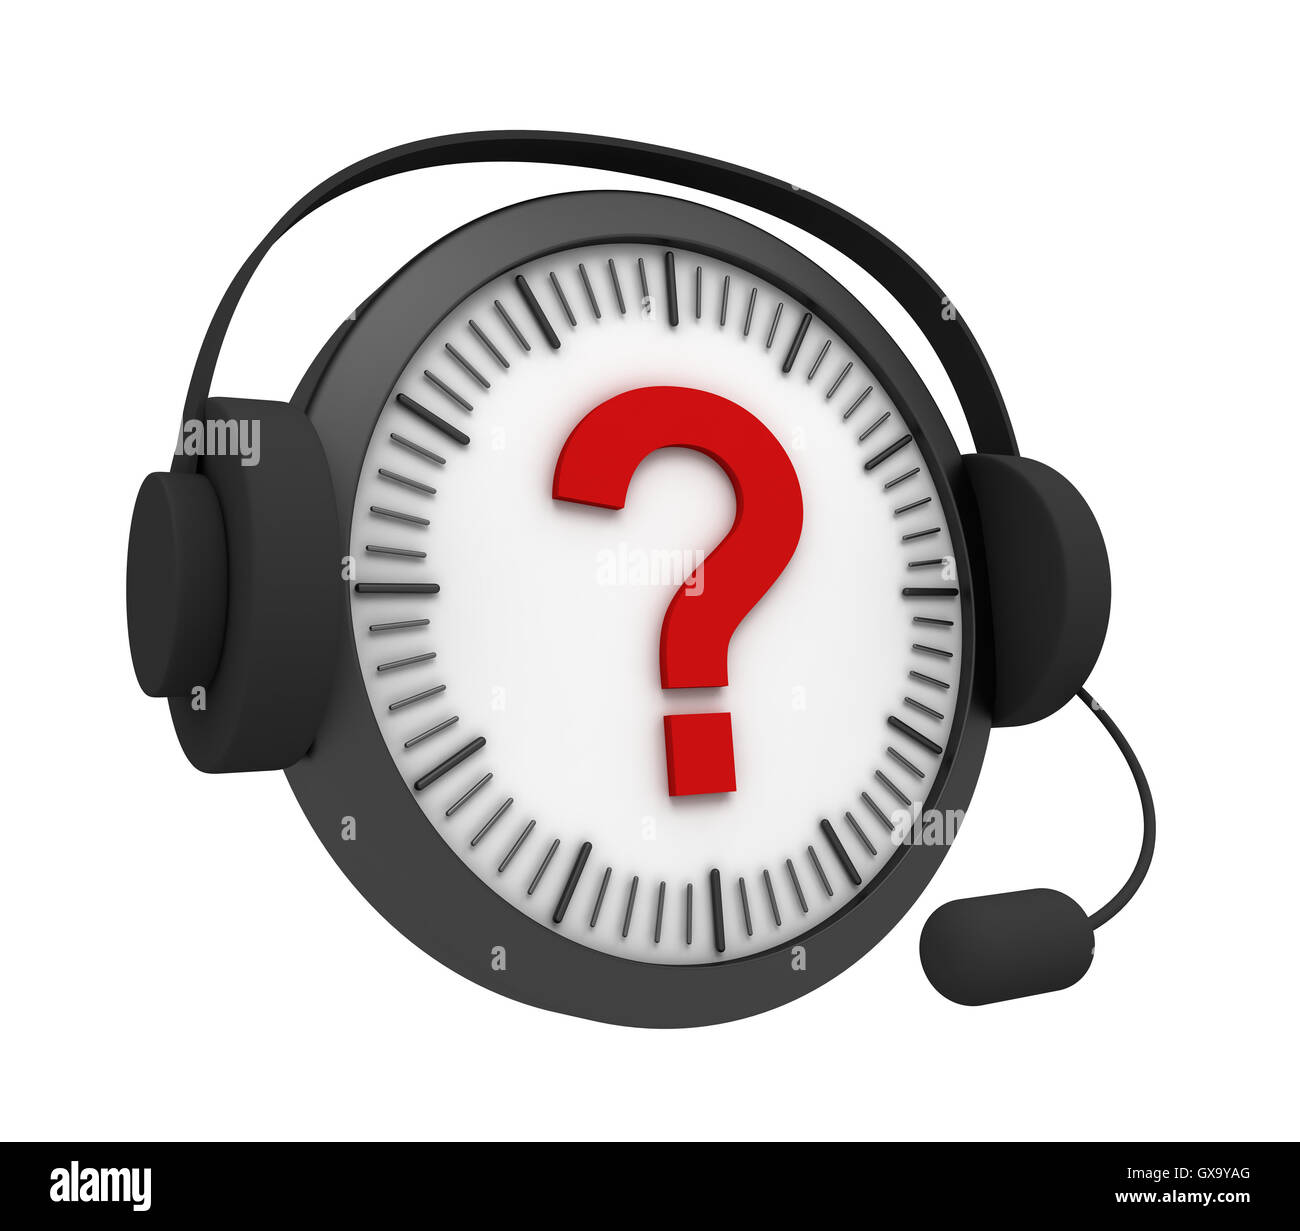 customer service question clock 3d illustration - Stock Image